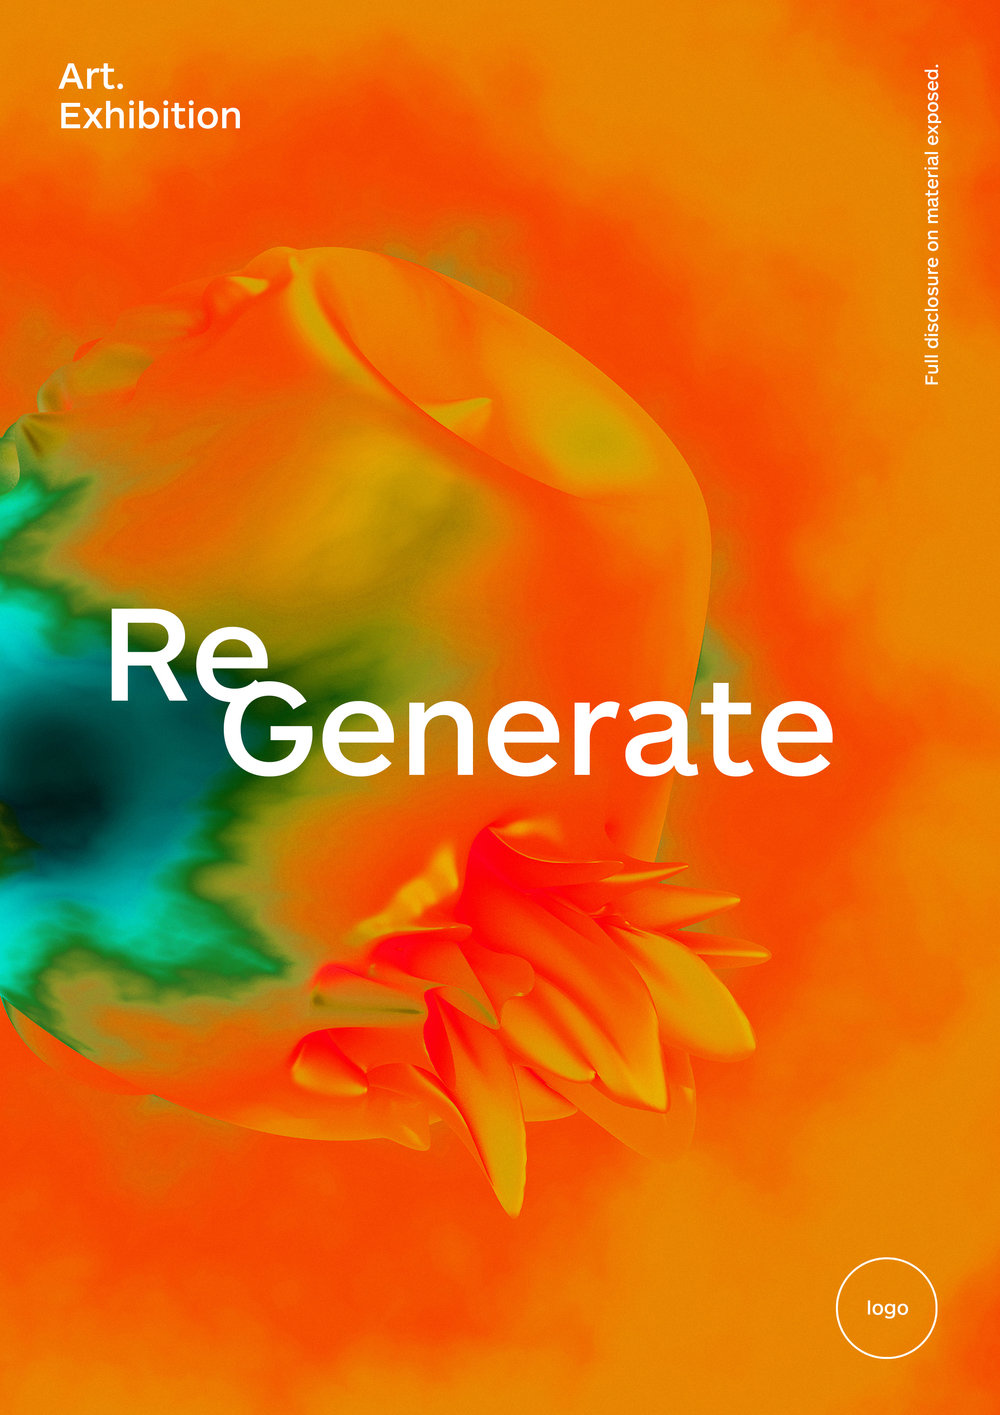 ReGenerate_Test 1_A4_002.jpg